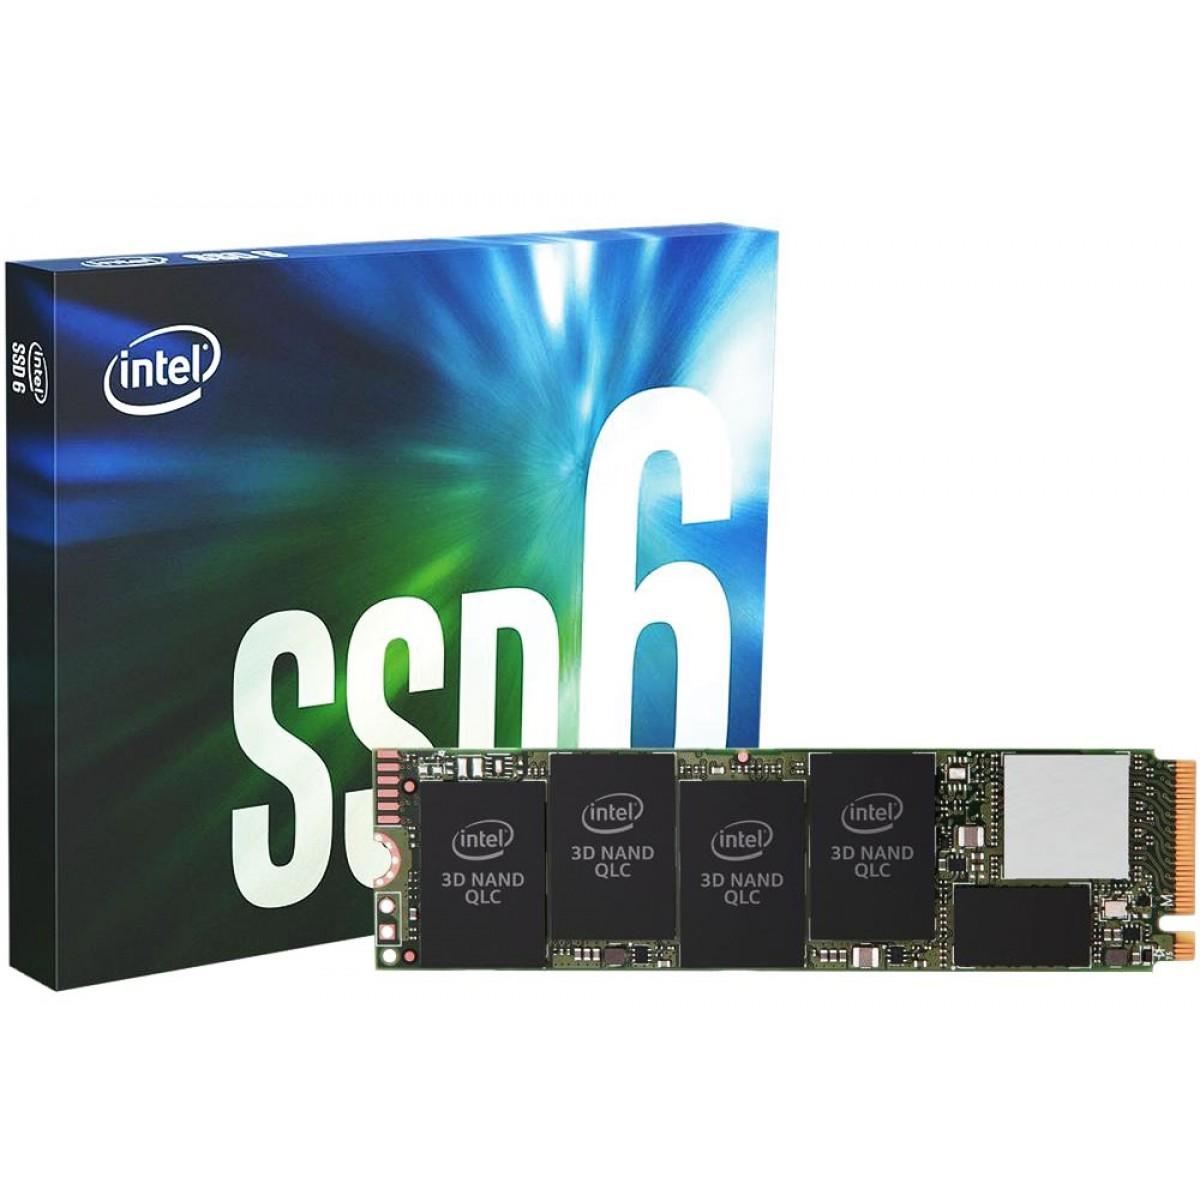 SSD Intel 660p, 1TB, M.2 NVMe, Leitura 1800MBs e Gravação 1800MBs, SSDPEKNW010T8X1